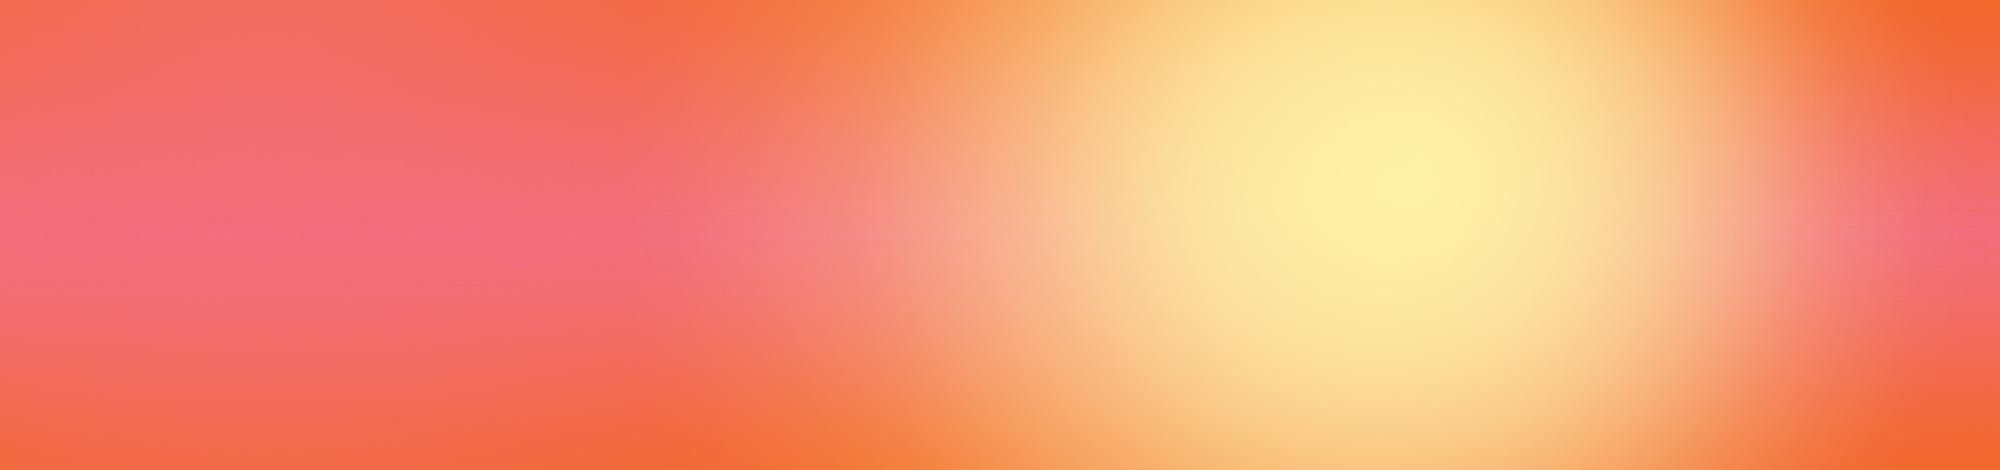 peach-copy1